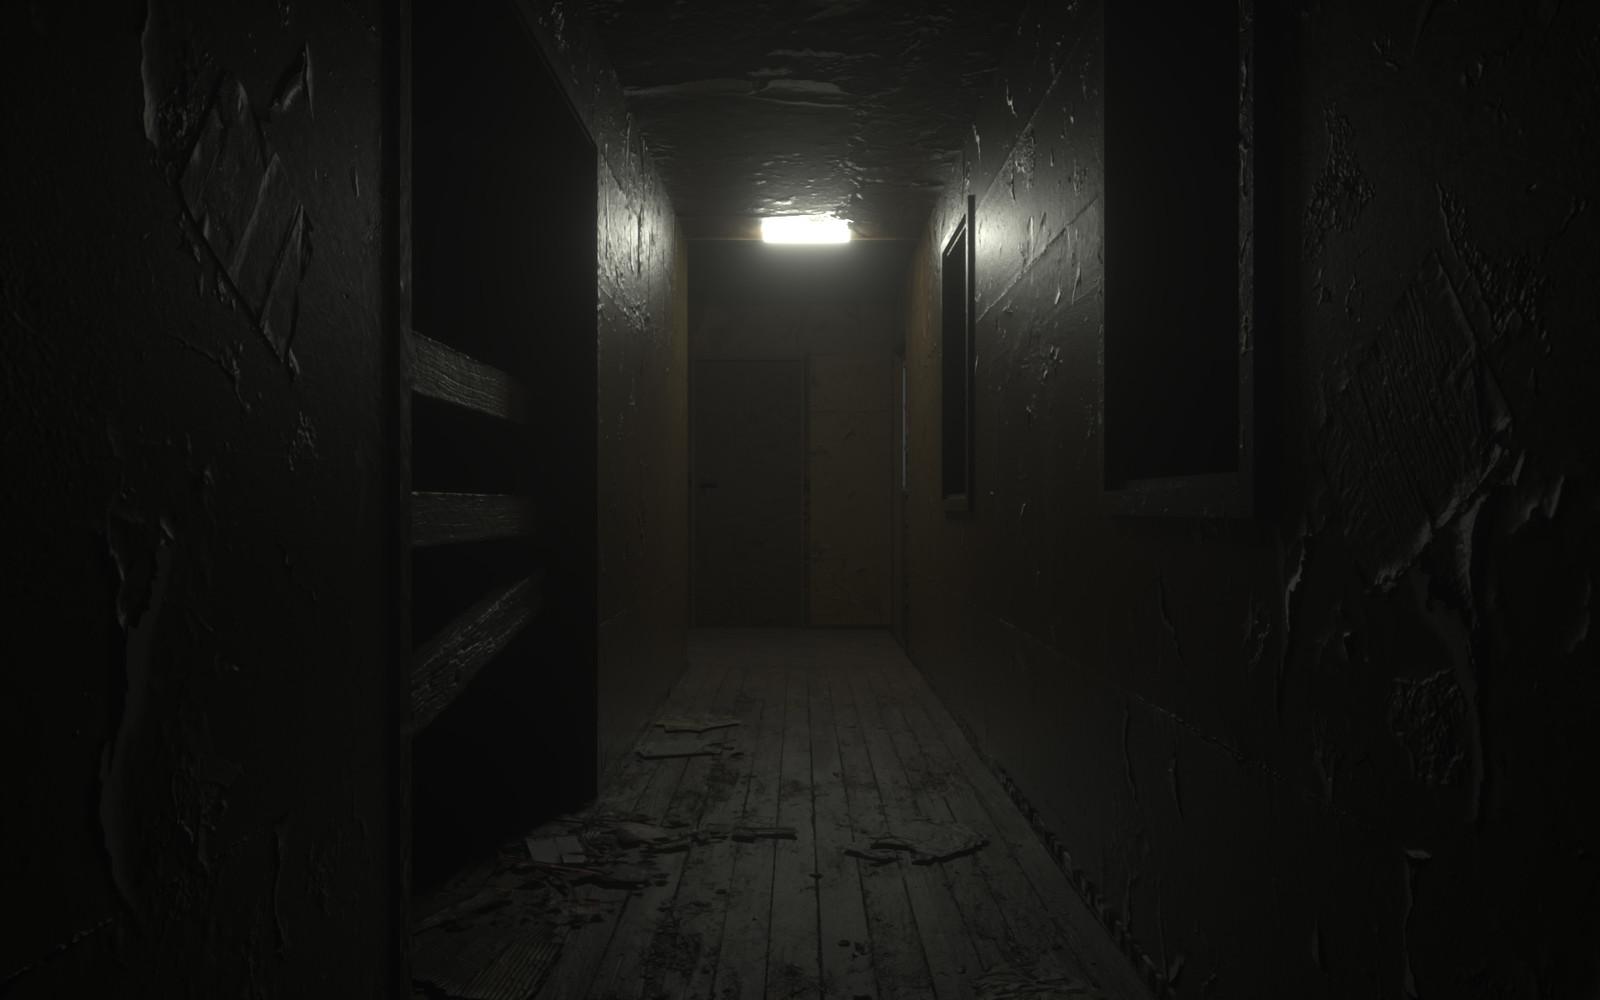 First Lighting Idea